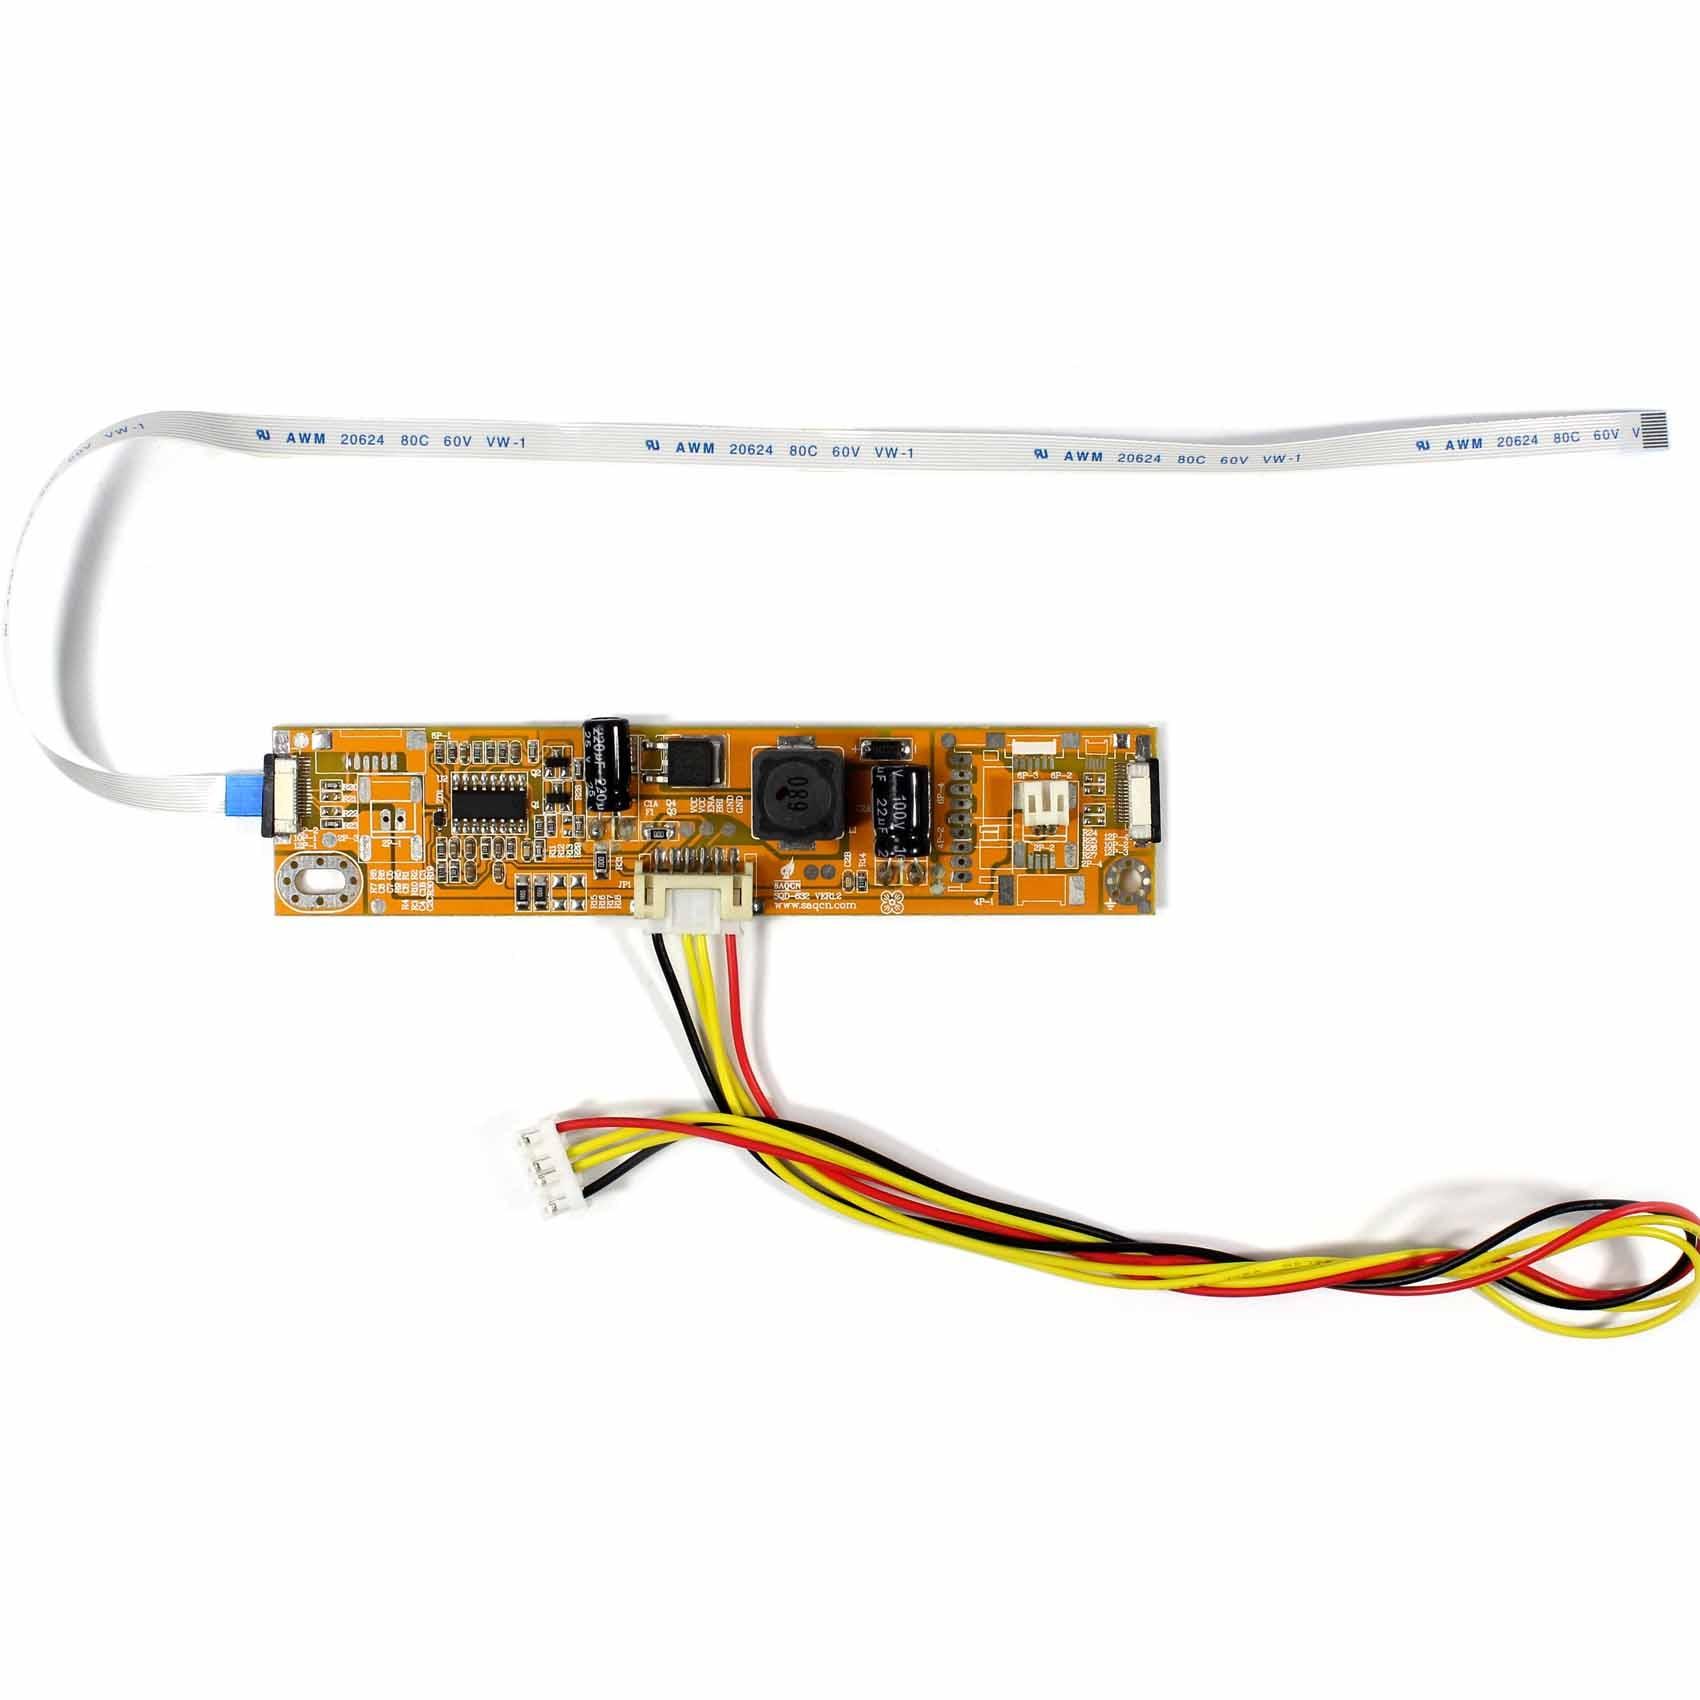 LED Placa Do Inversor Para LM185WH2 TLA1 MT190AW02 V4 LM185WH2-TLA1 LCD VS632A-2